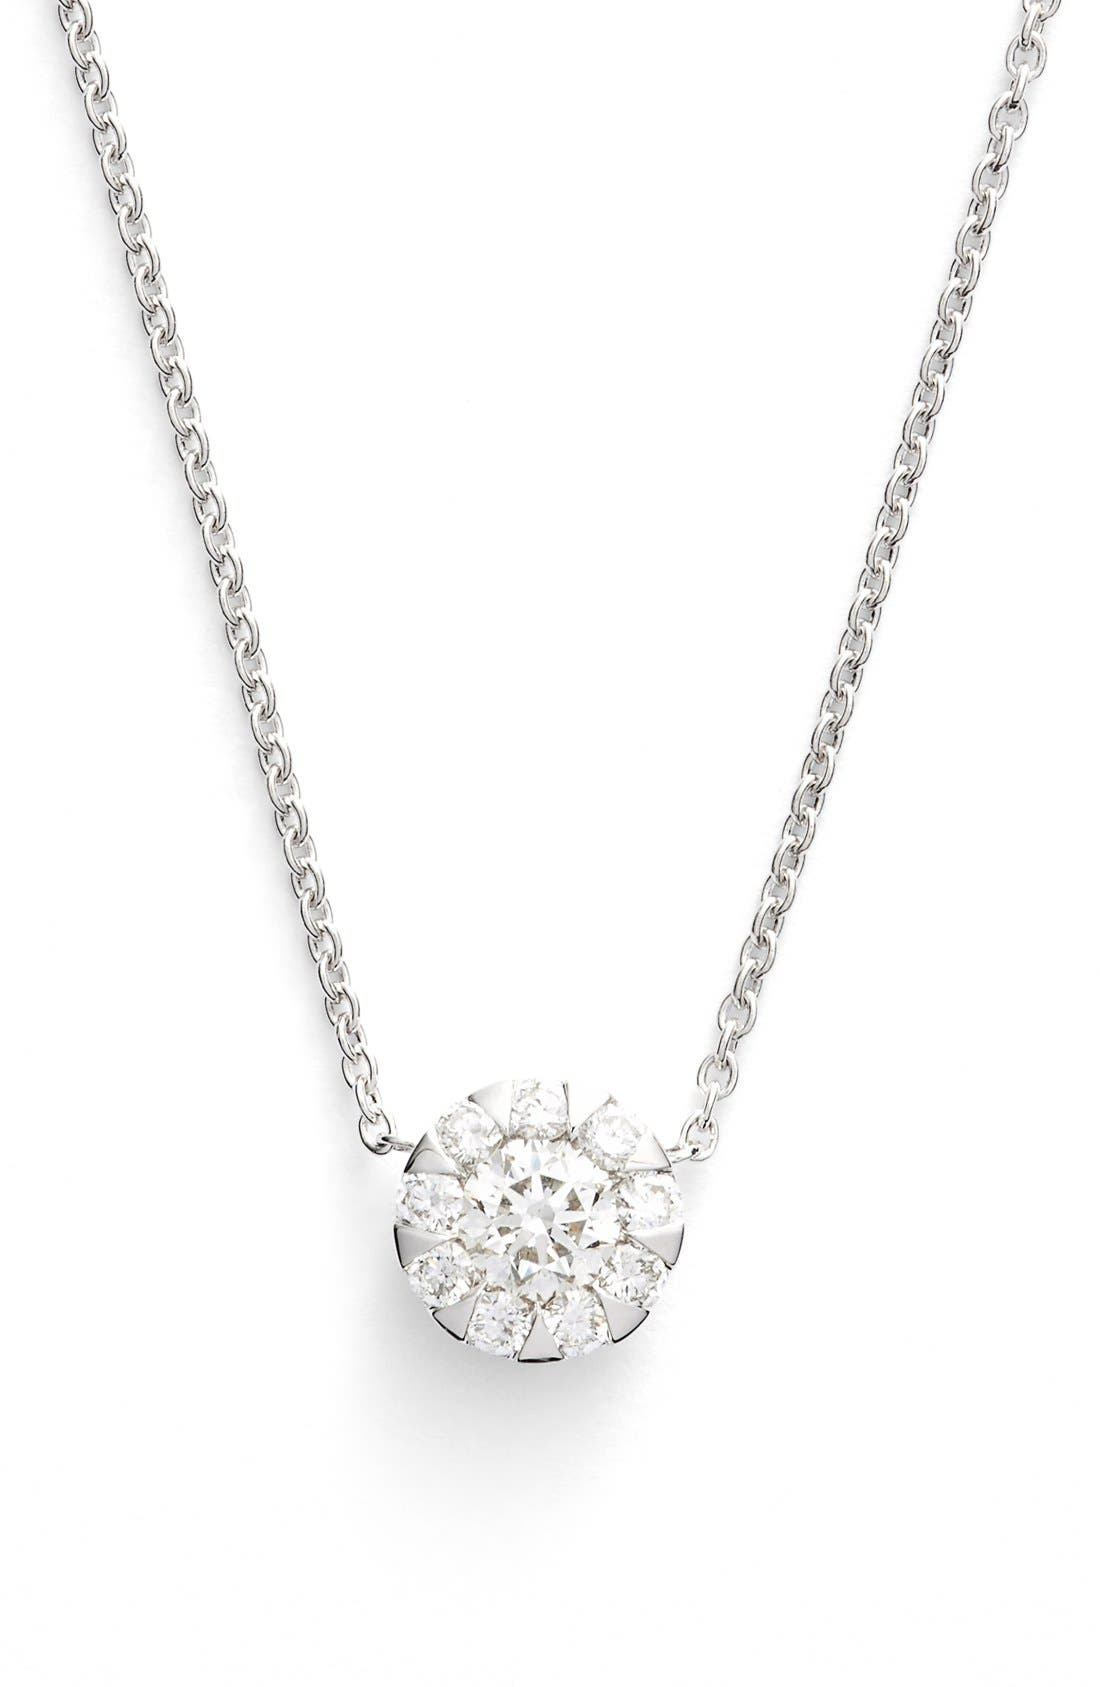 Kwiat 'Sunburst' Diamond Pendant Necklace